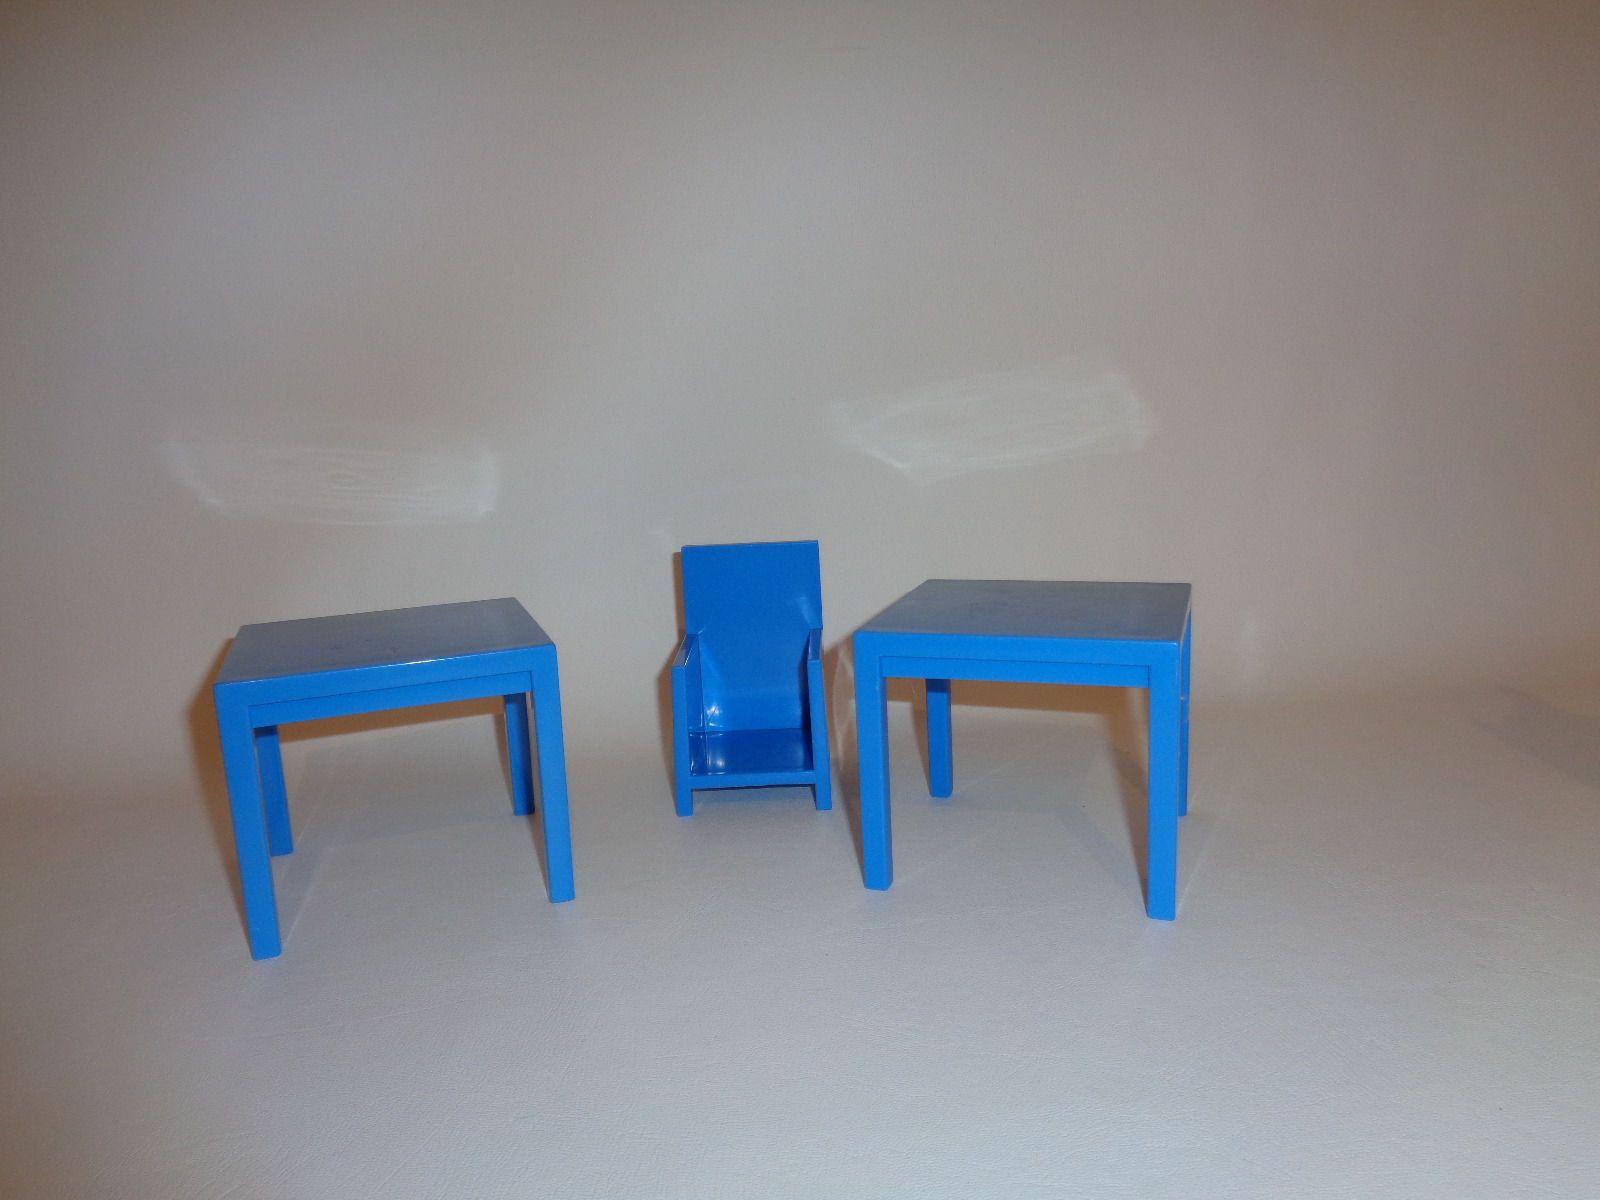 dolls house furniture ikea. Wonderful Ikea Ikea Dolls House Furniture Blue Furniture  Ebay L With Dolls House Furniture Ikea